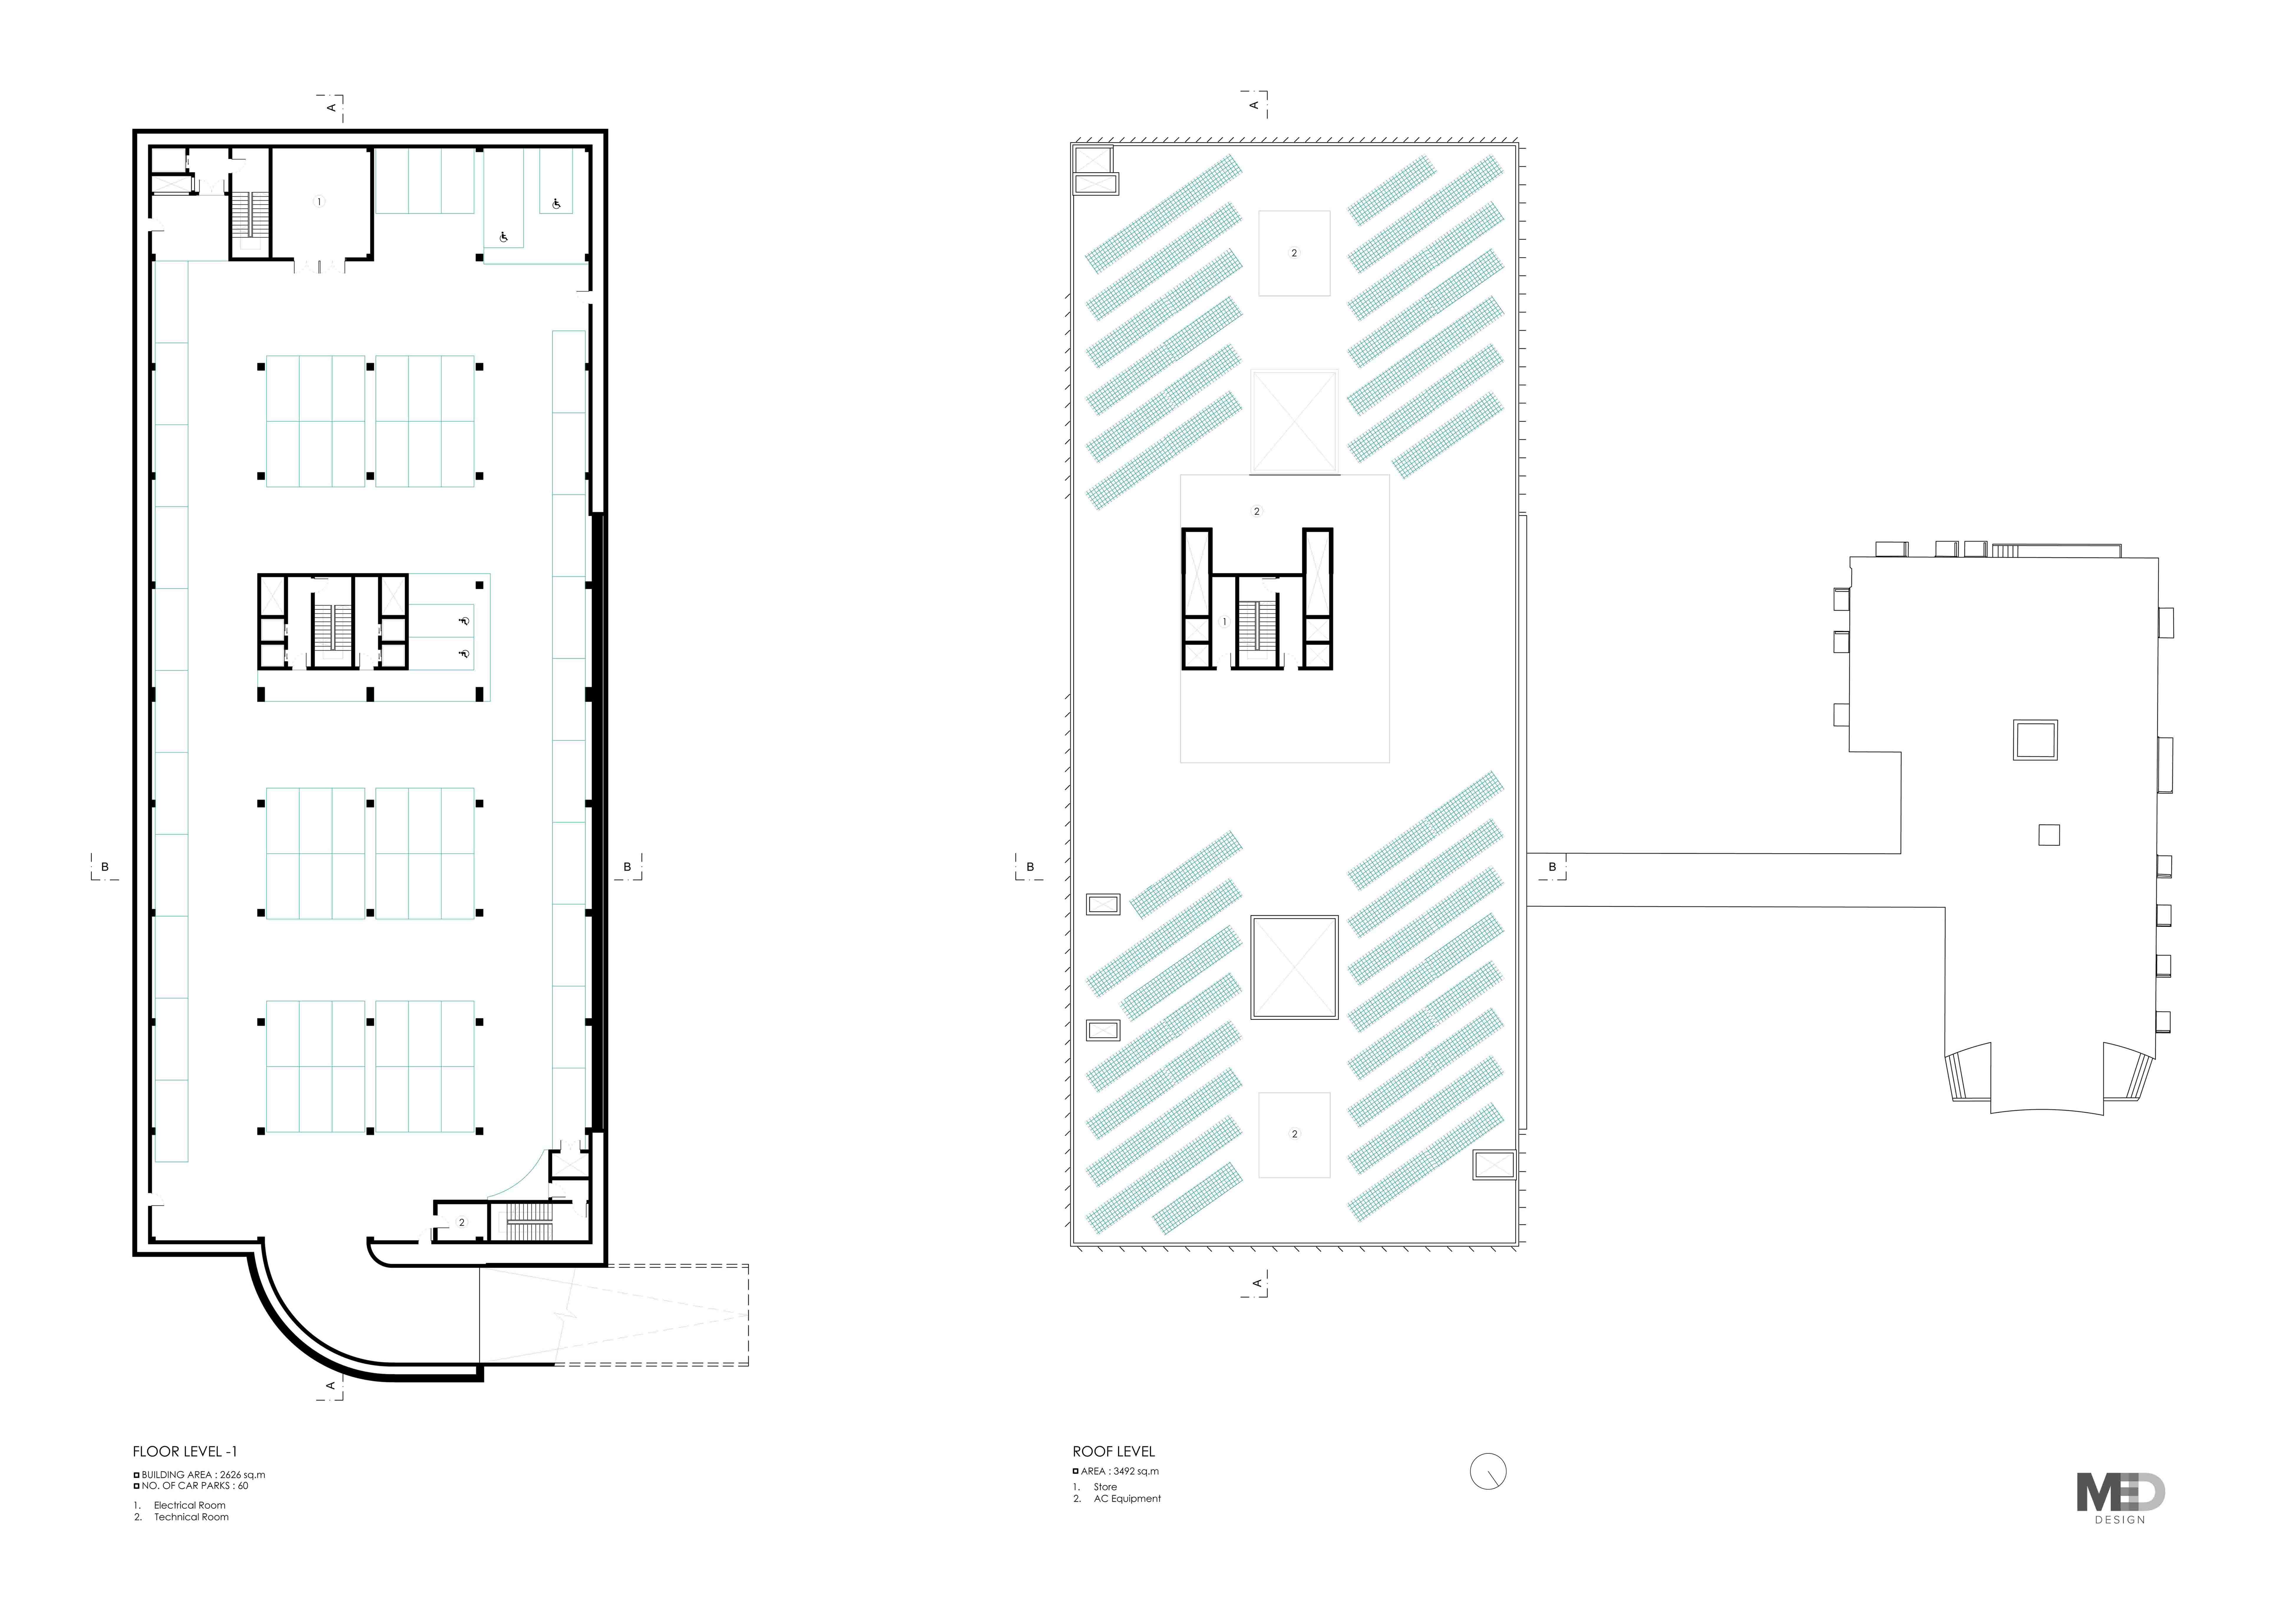 Basement & Roof Plans Claudia Gallo}